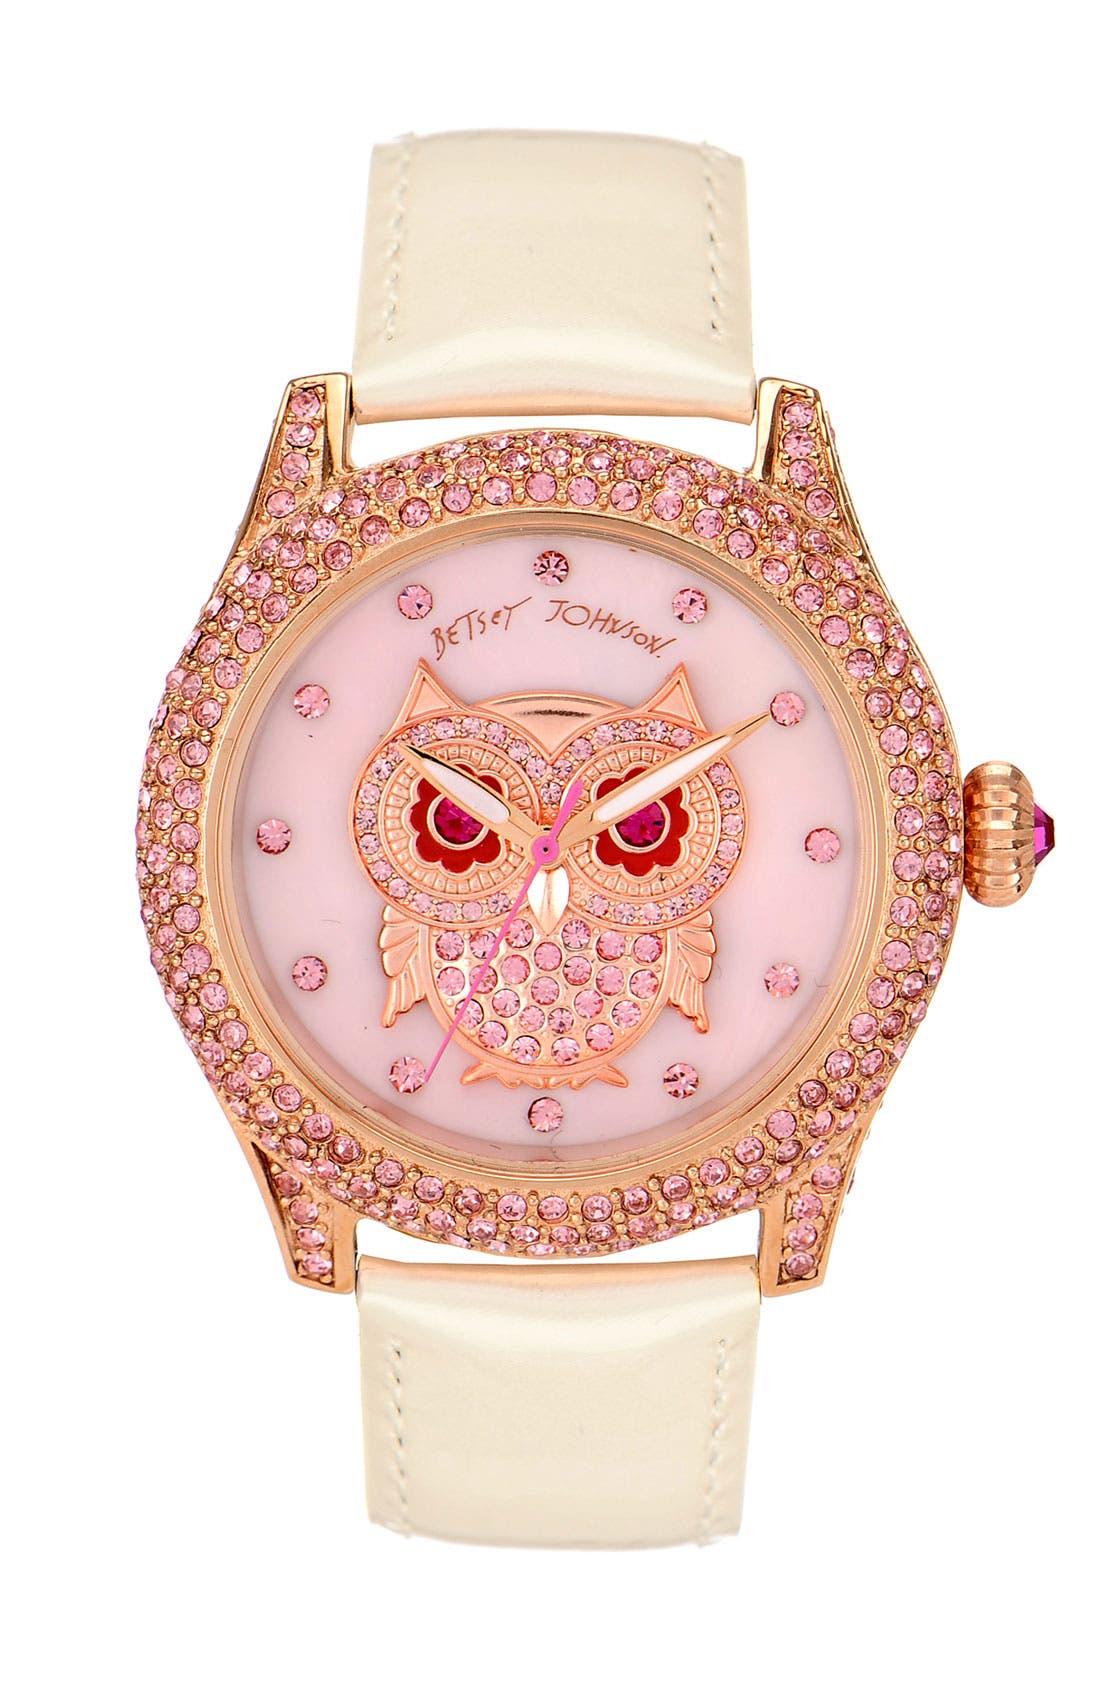 Alternate Image 1 Selected - Betsey Johnson 'Bling Bling Time' Owl Dial Watch, 40mm